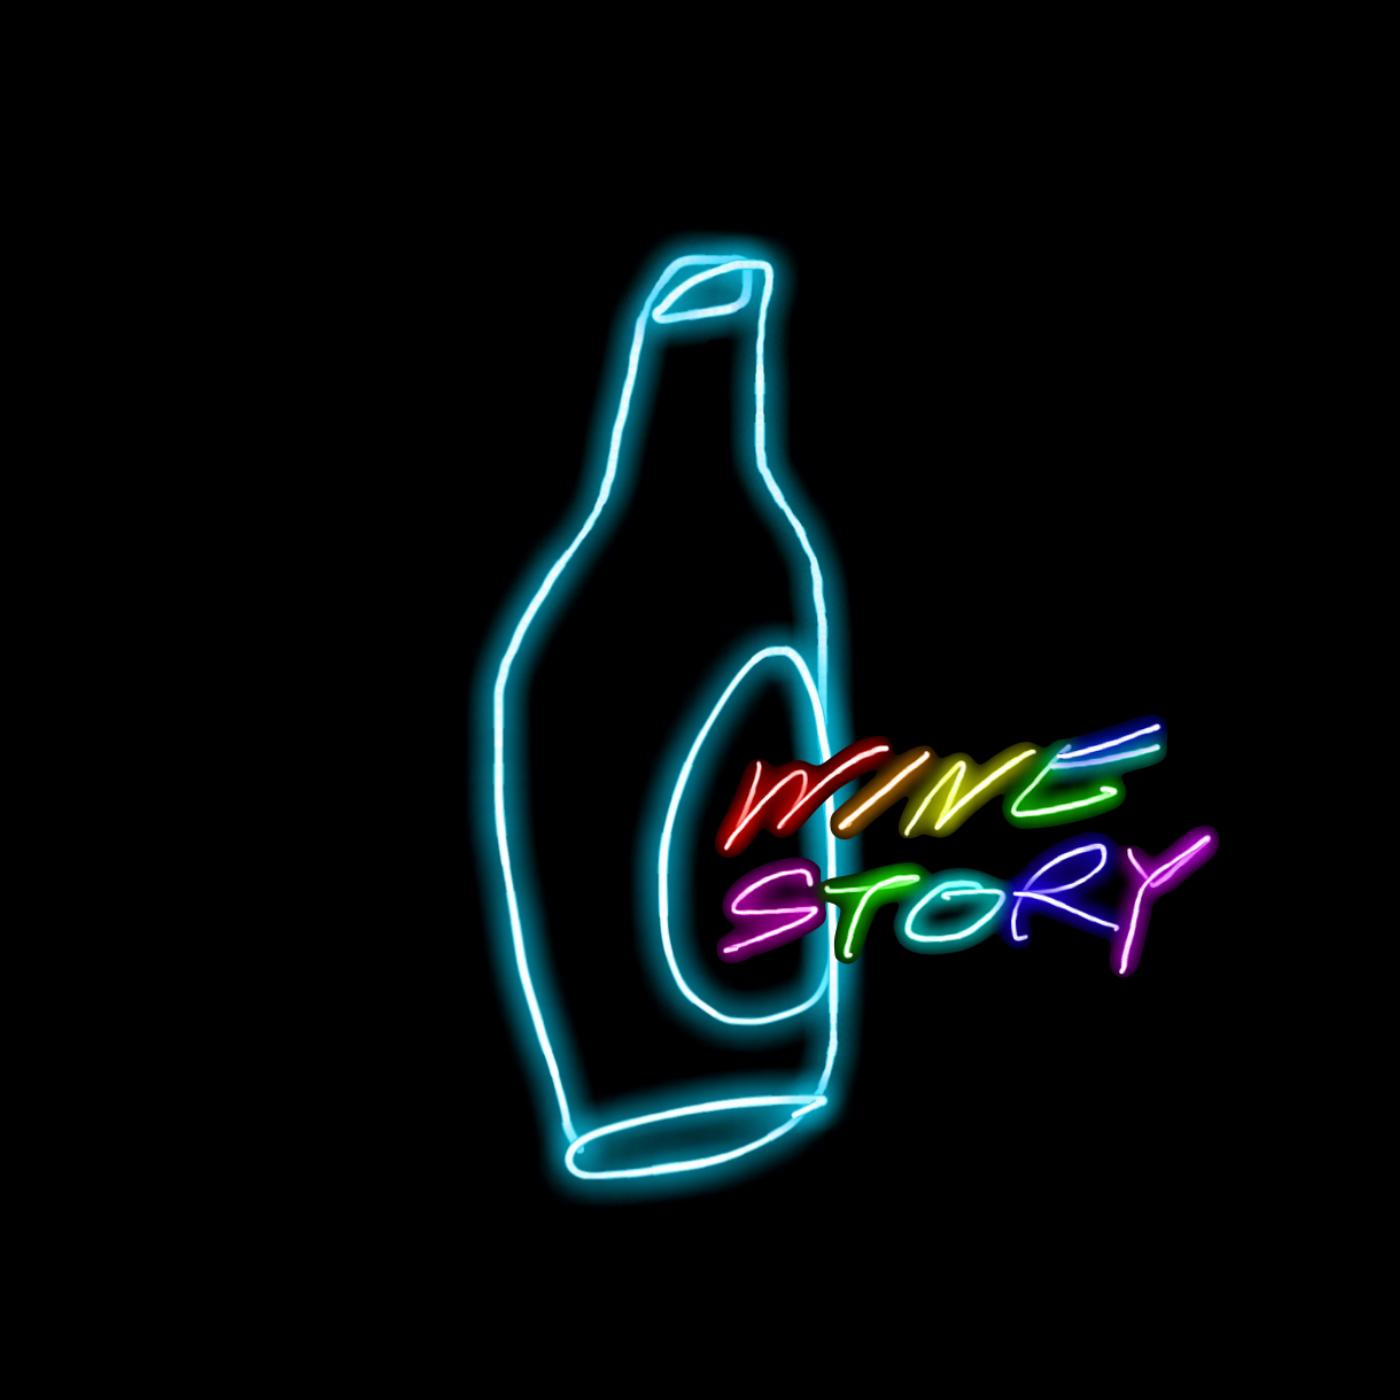 酒嶼故事 WINE STORY